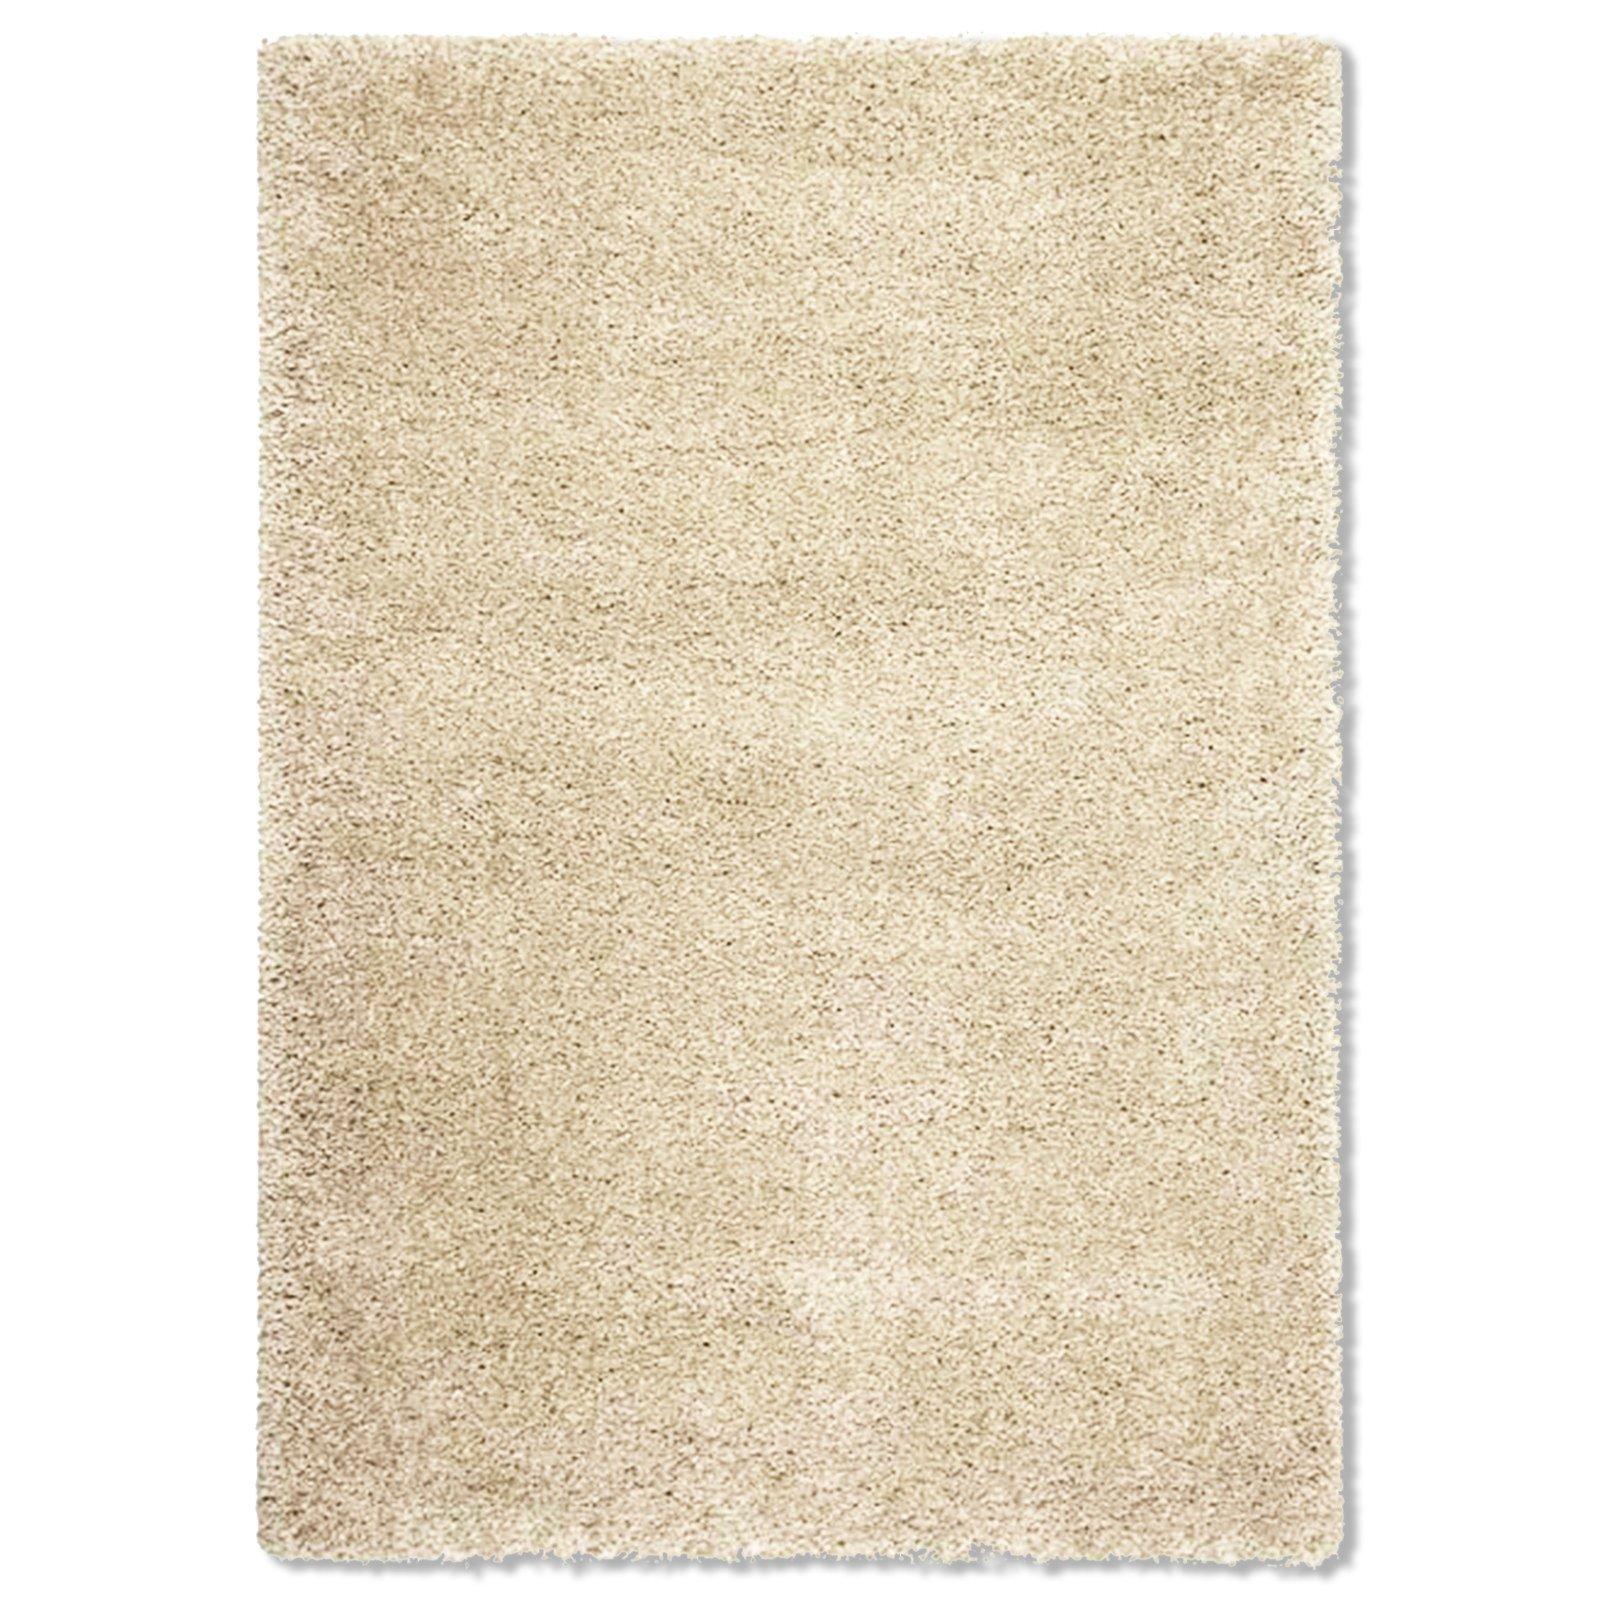 teppich shaggy de luxe beige braun 120x170 cm. Black Bedroom Furniture Sets. Home Design Ideas